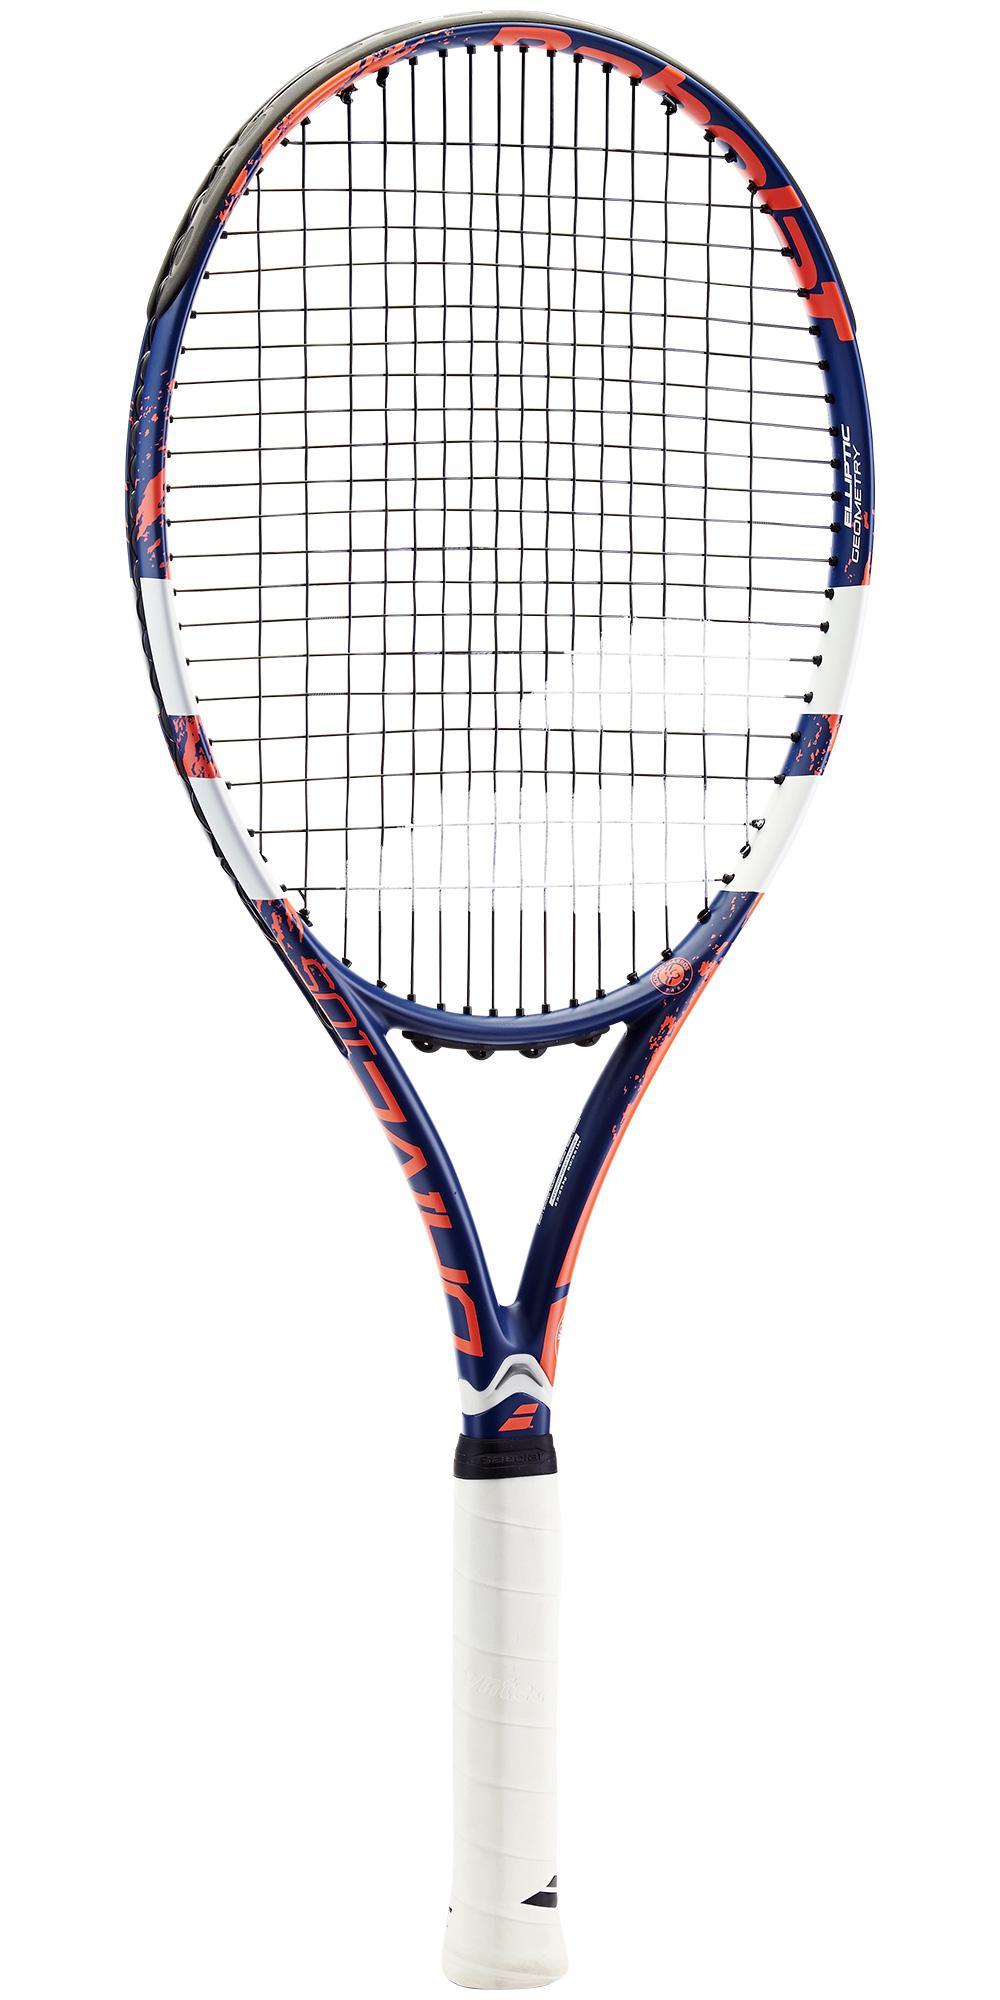 adf05a0ce476 Babolat Drive 105 French Open Tennis Racket - Tennisnuts.com